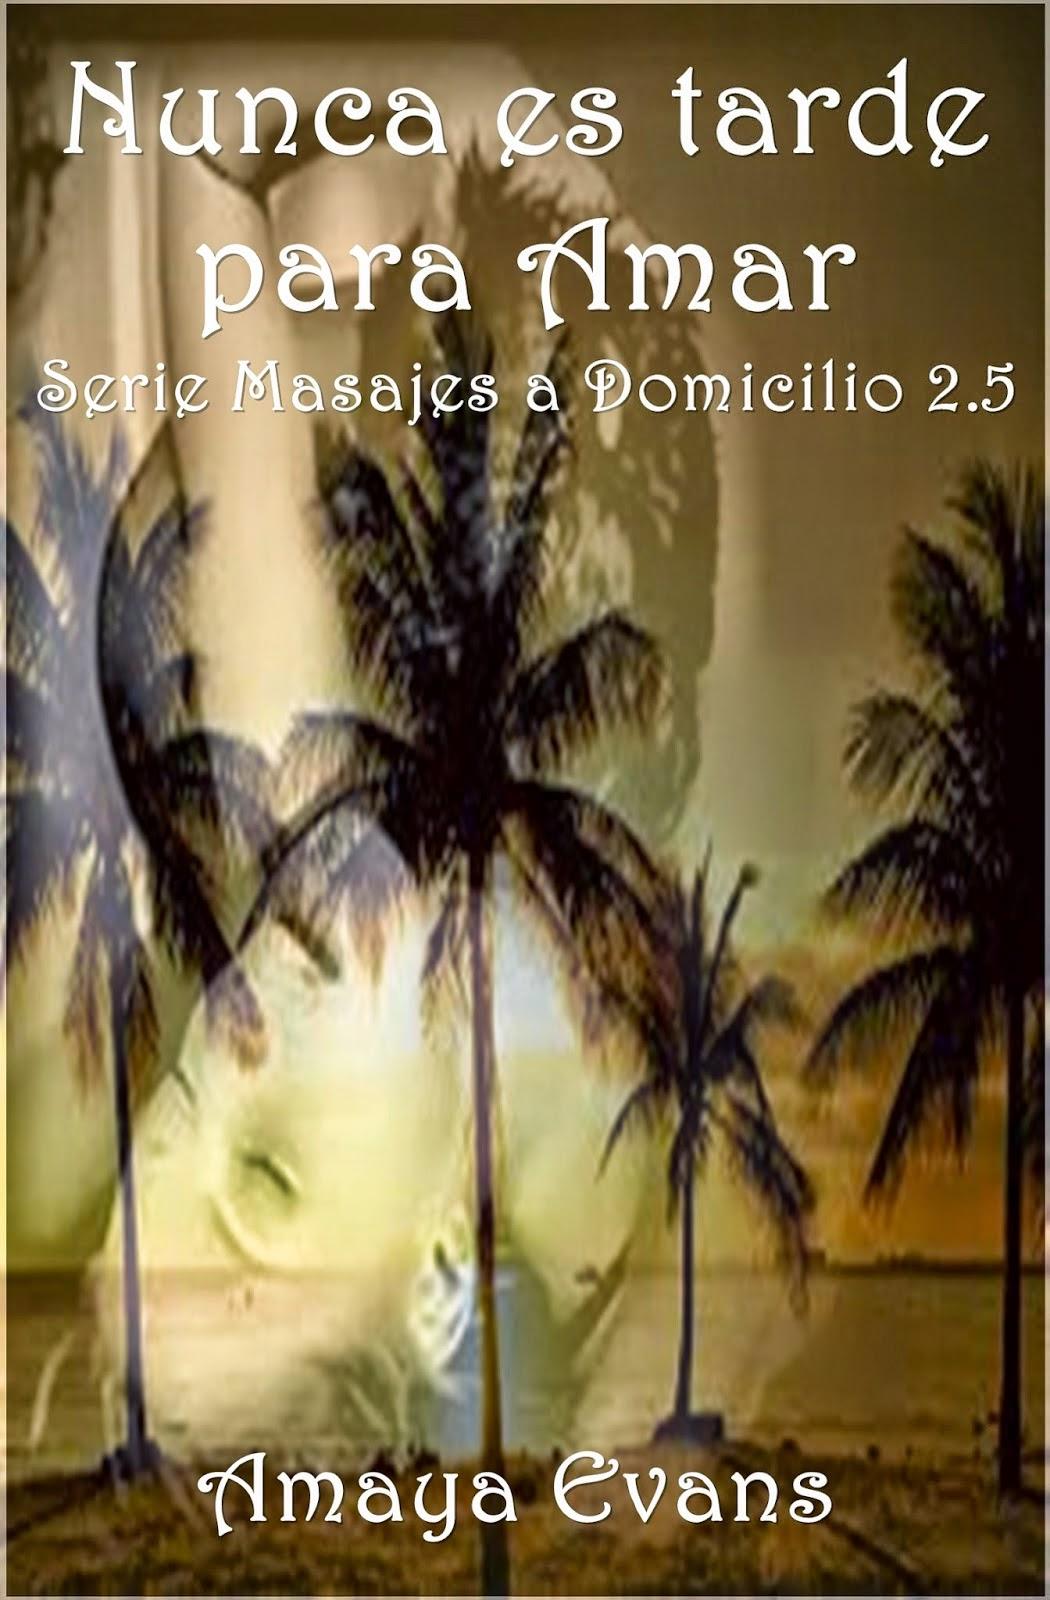 Serie Masajes a domicilio - Amaya Evans (EPUB+PDF) Portada%2B4